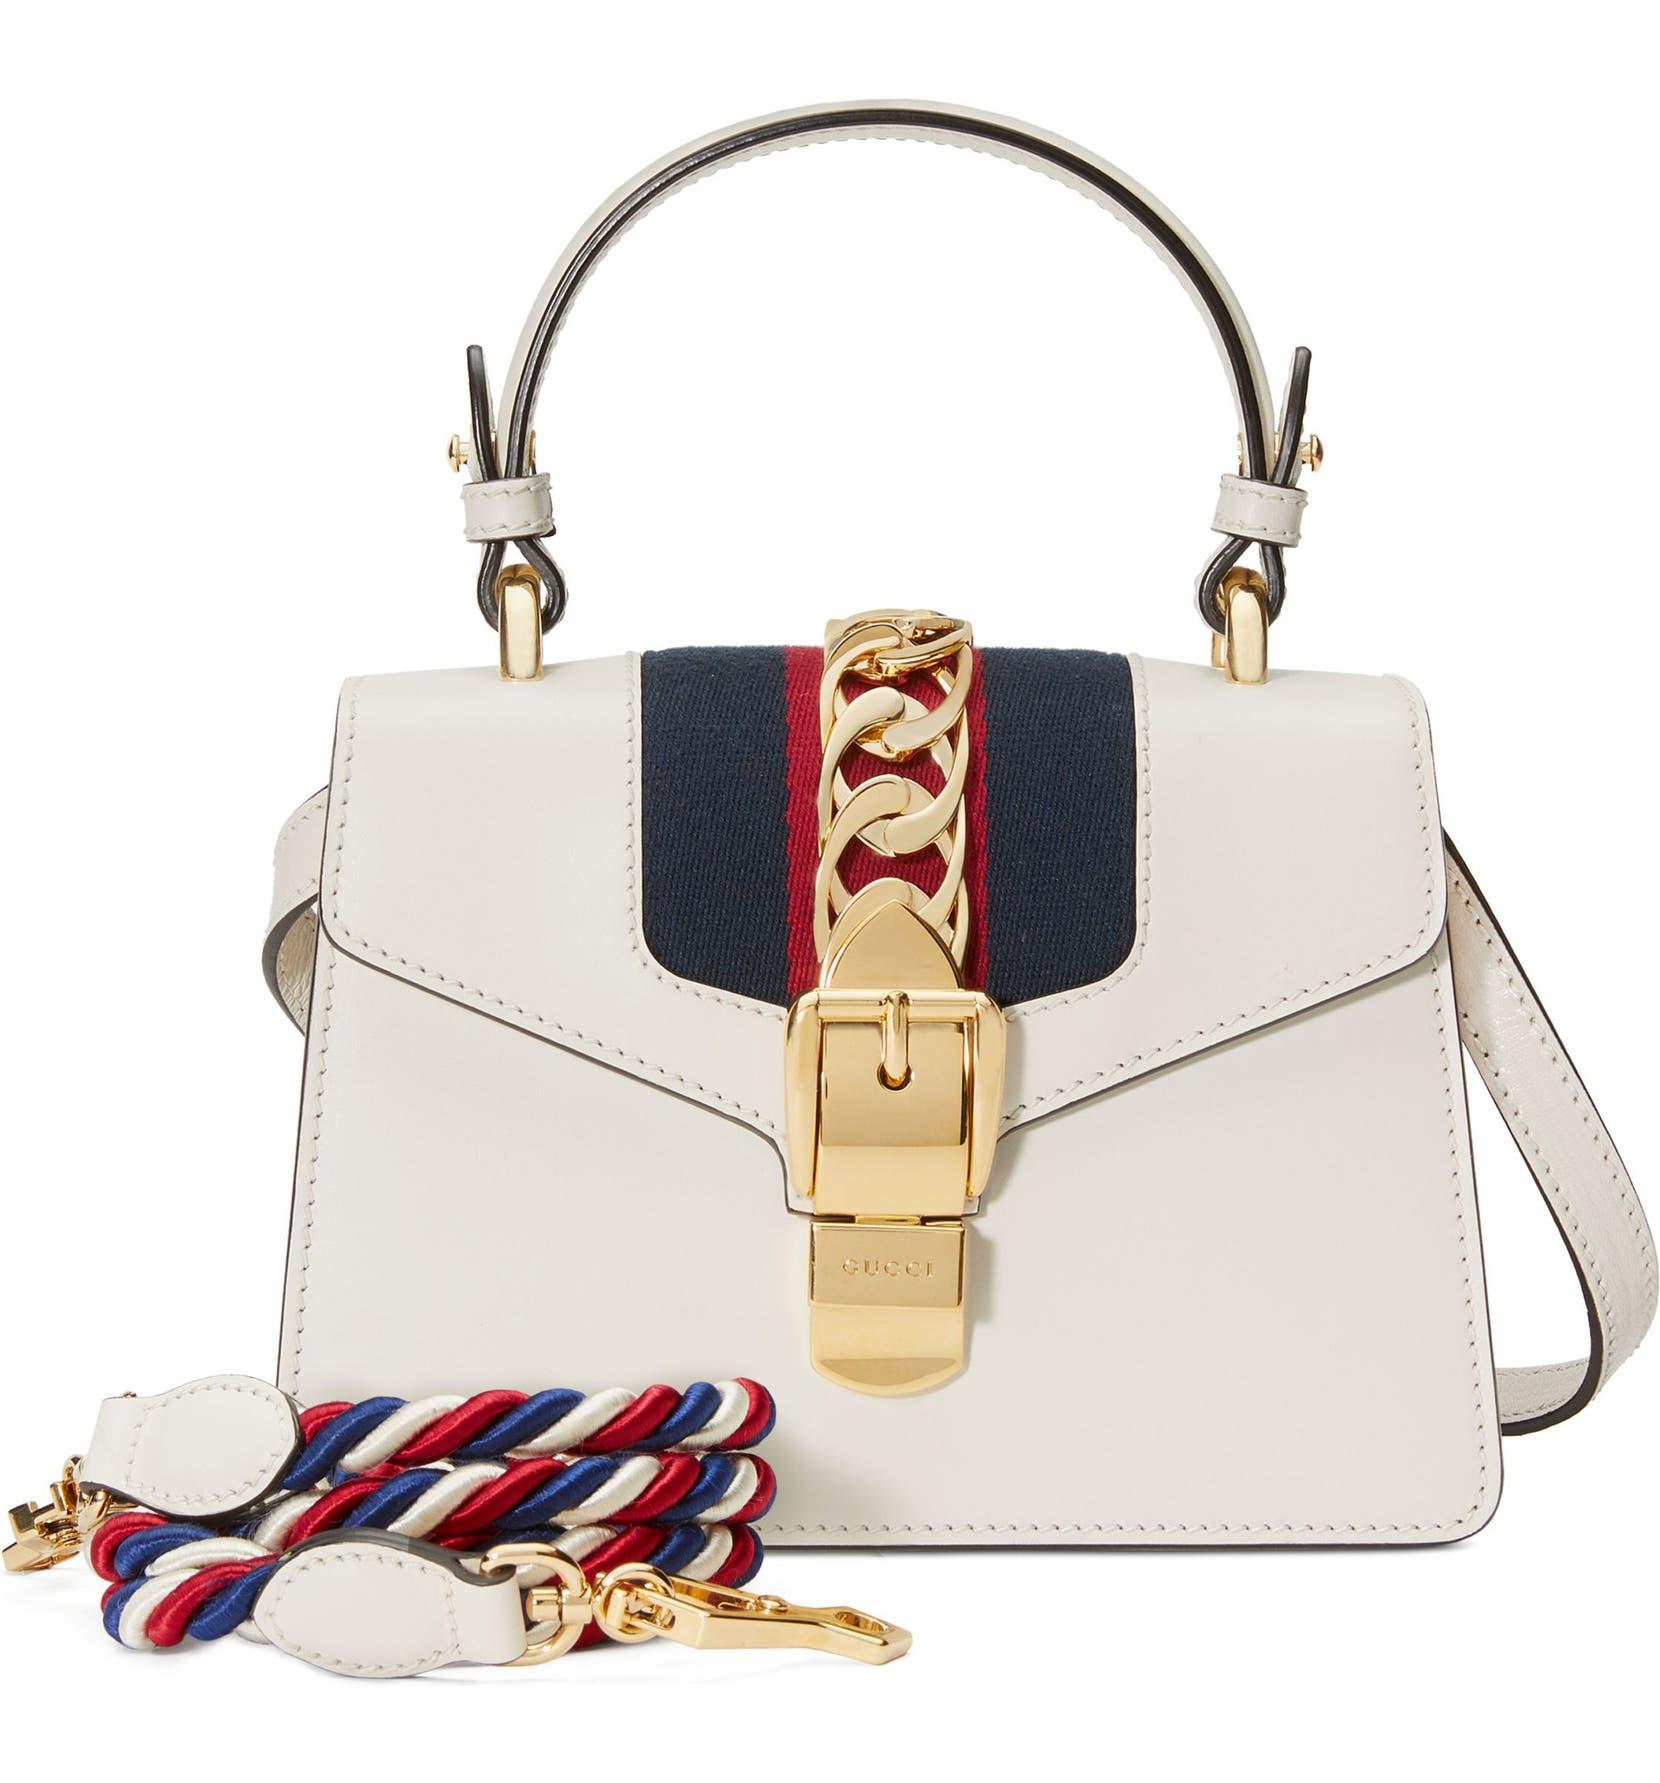 a1502678d0a371 Gucci Mini Sylvie Top Handle Leather Shoulder Bag | Nordstrom